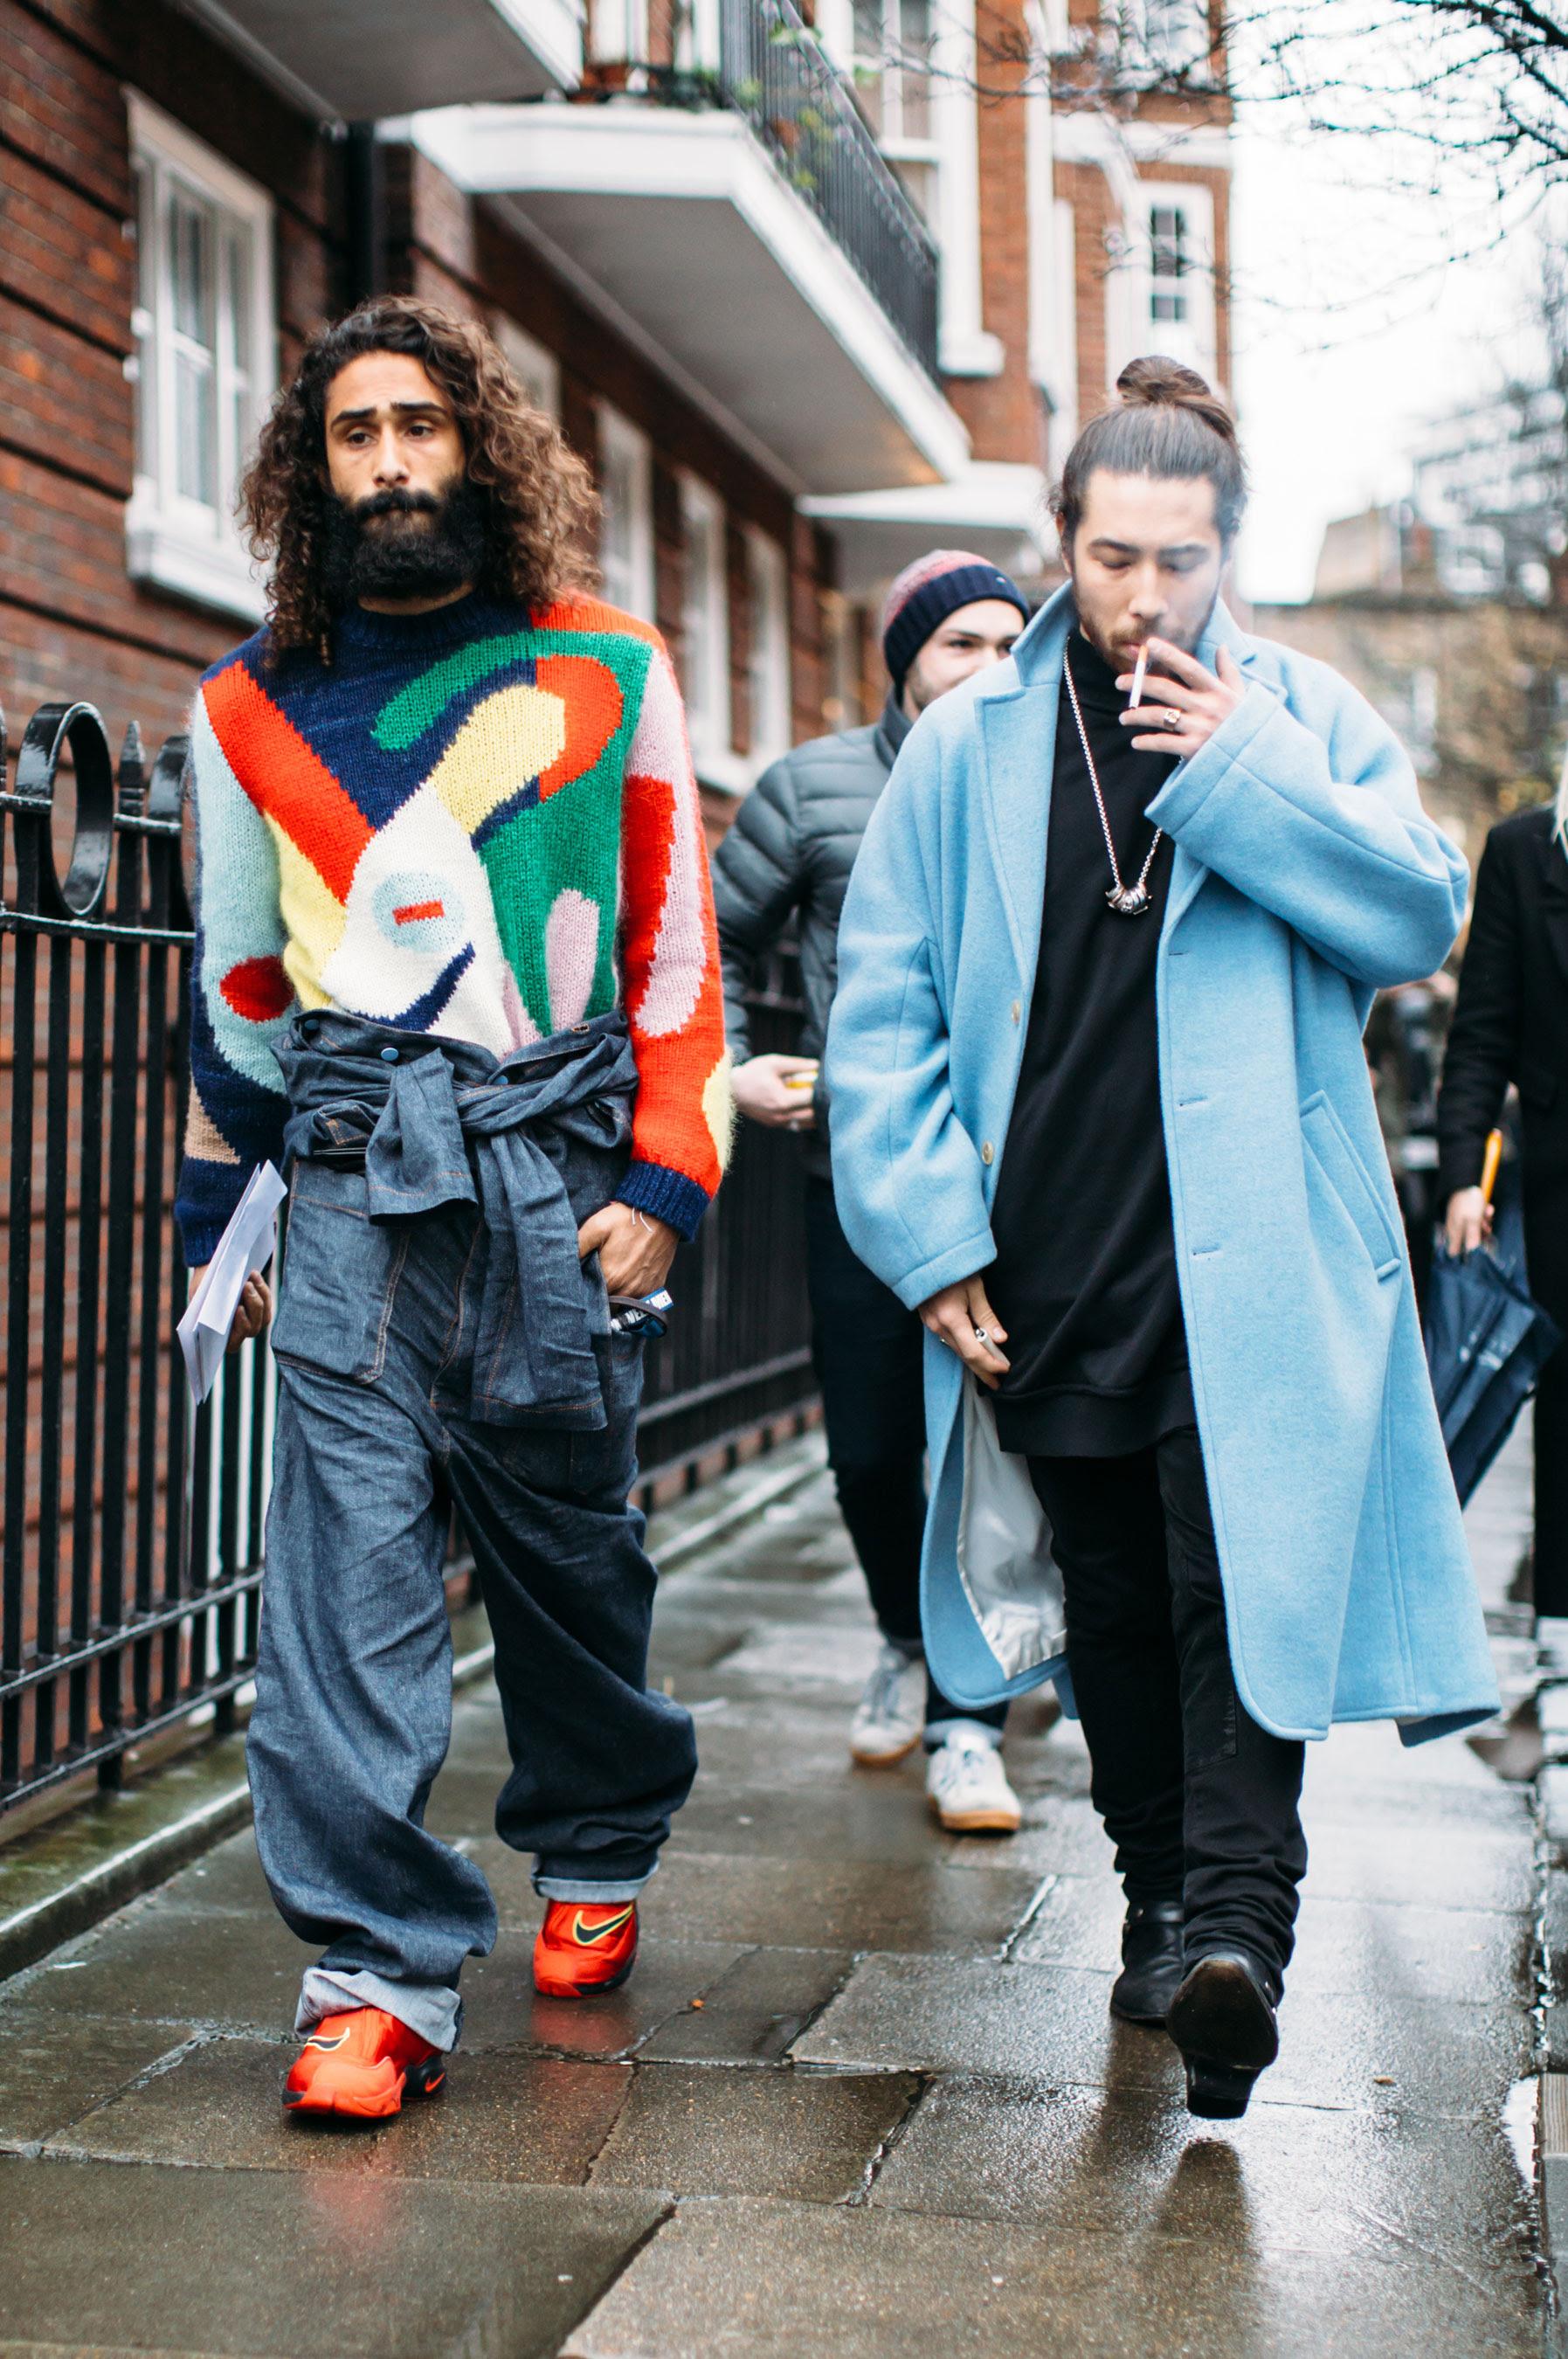 Street Style At London Men 39 S Fashion Week Fall Winter 2017 2018 Day 4 The Wonderful World Of